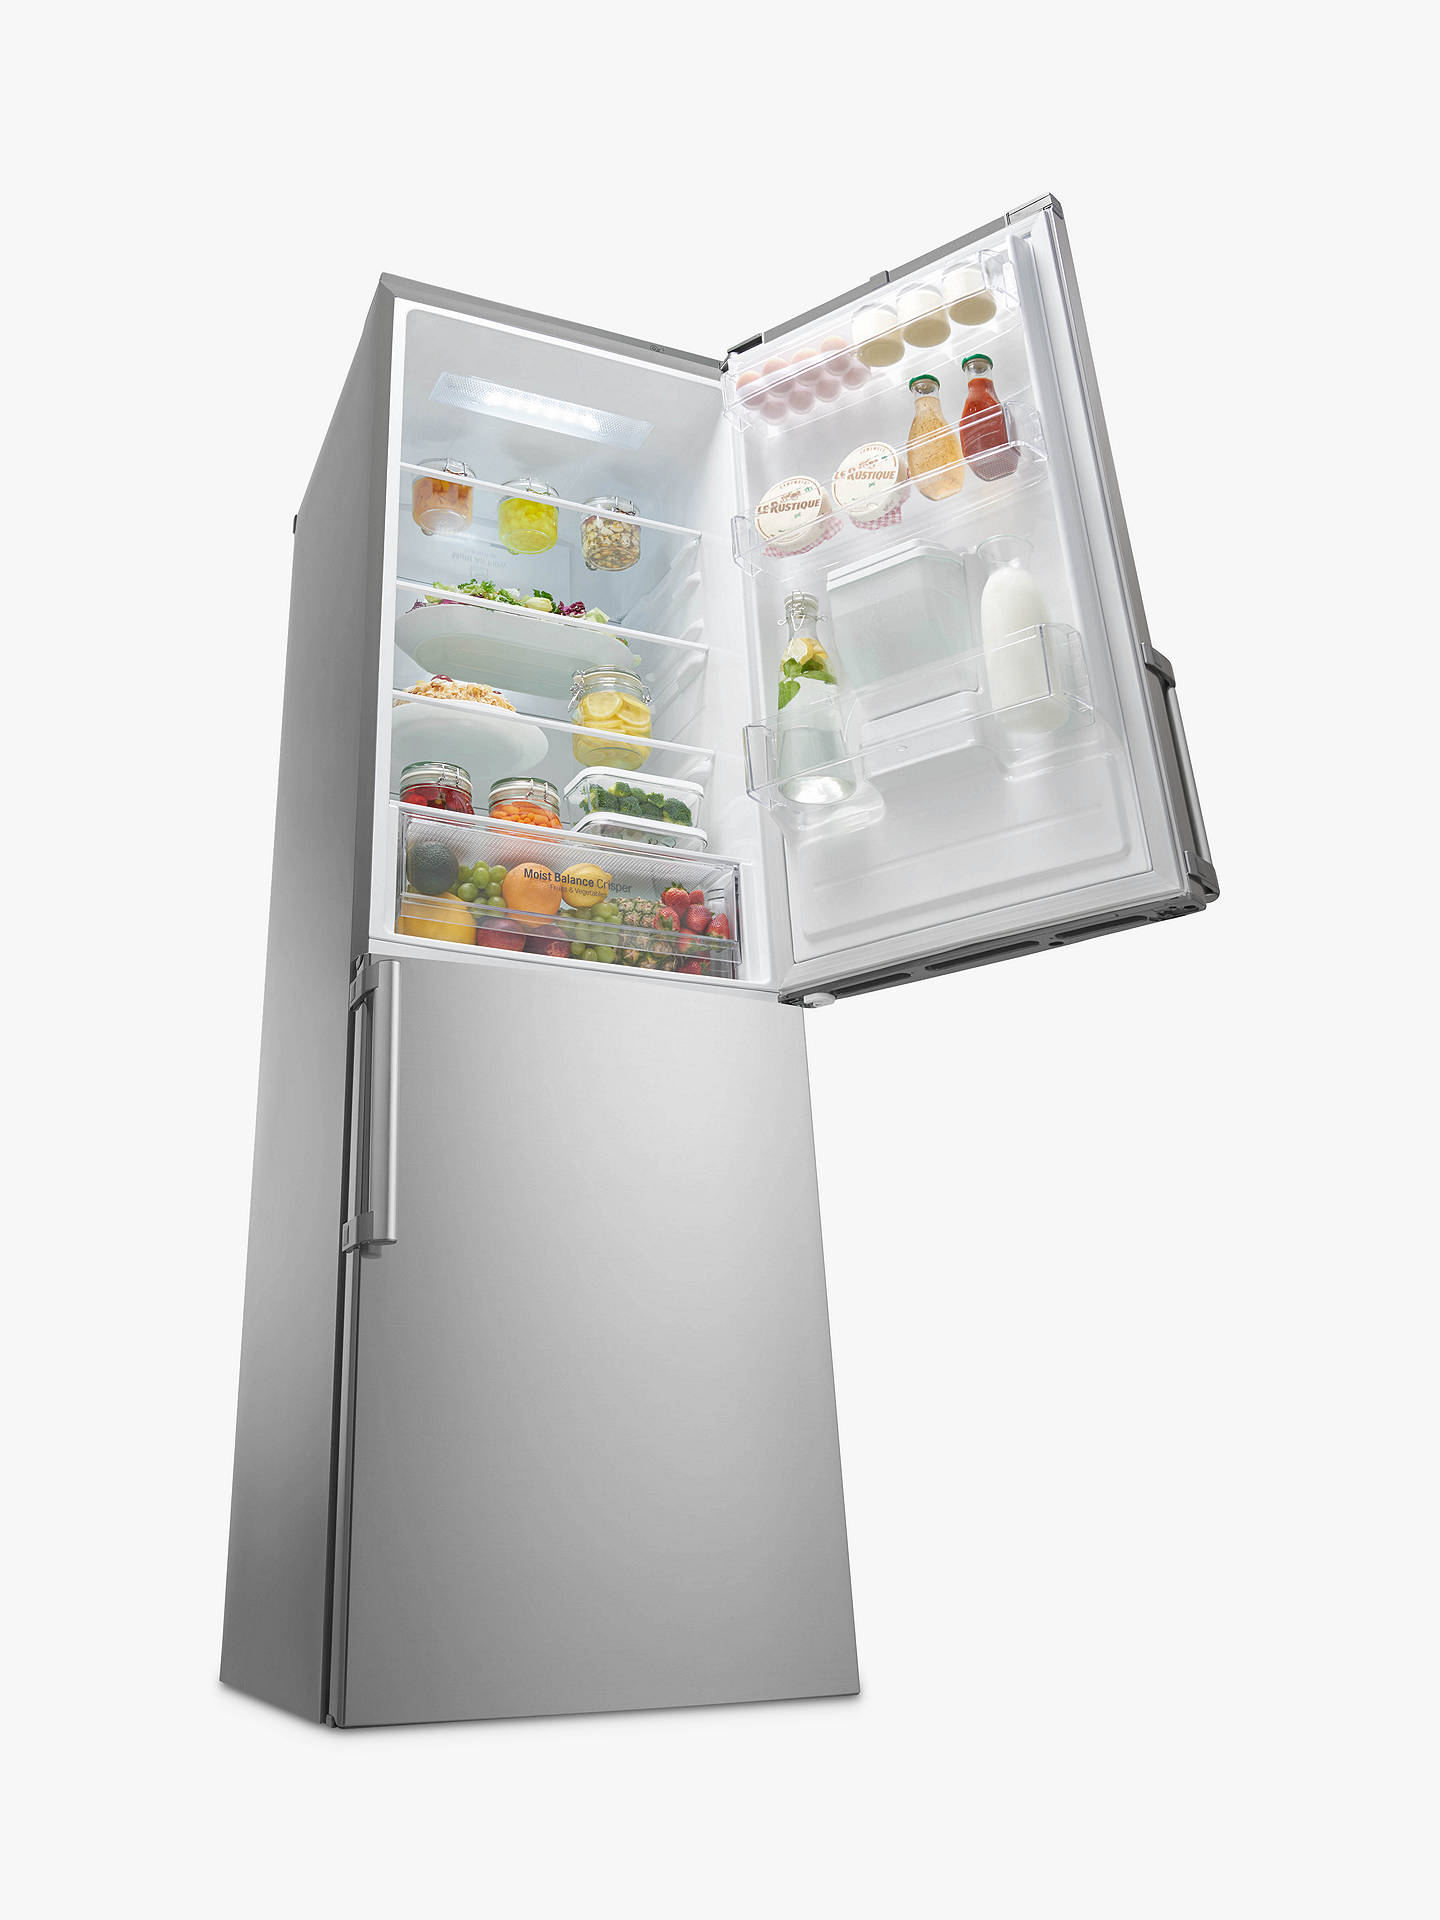 LG GBF59PZKZB Freestanding Fridge Freezer, A++ Energy rating, 60cm Wide,  Premium Steel